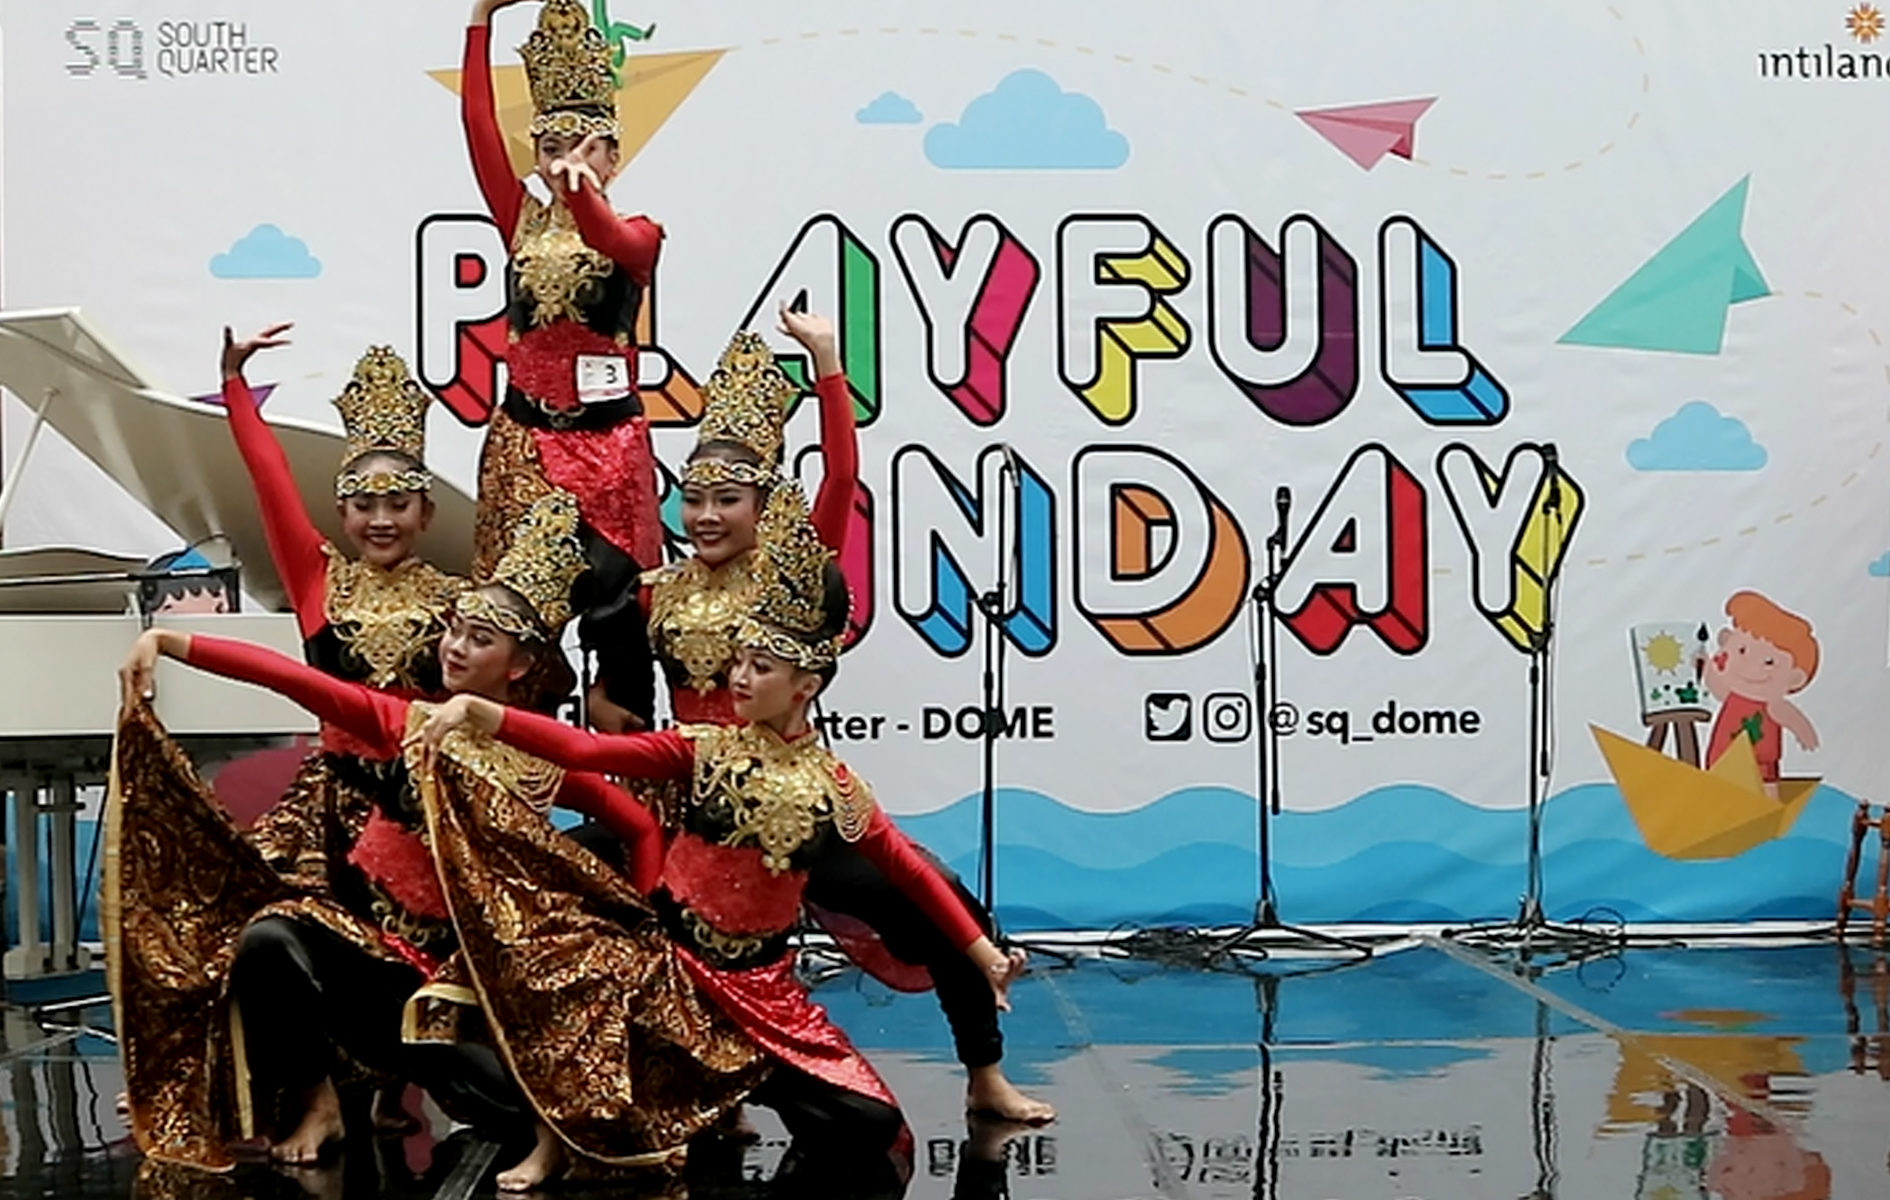 Gandes Pamantes Performance di Playfull Sunday South Quarter Dome